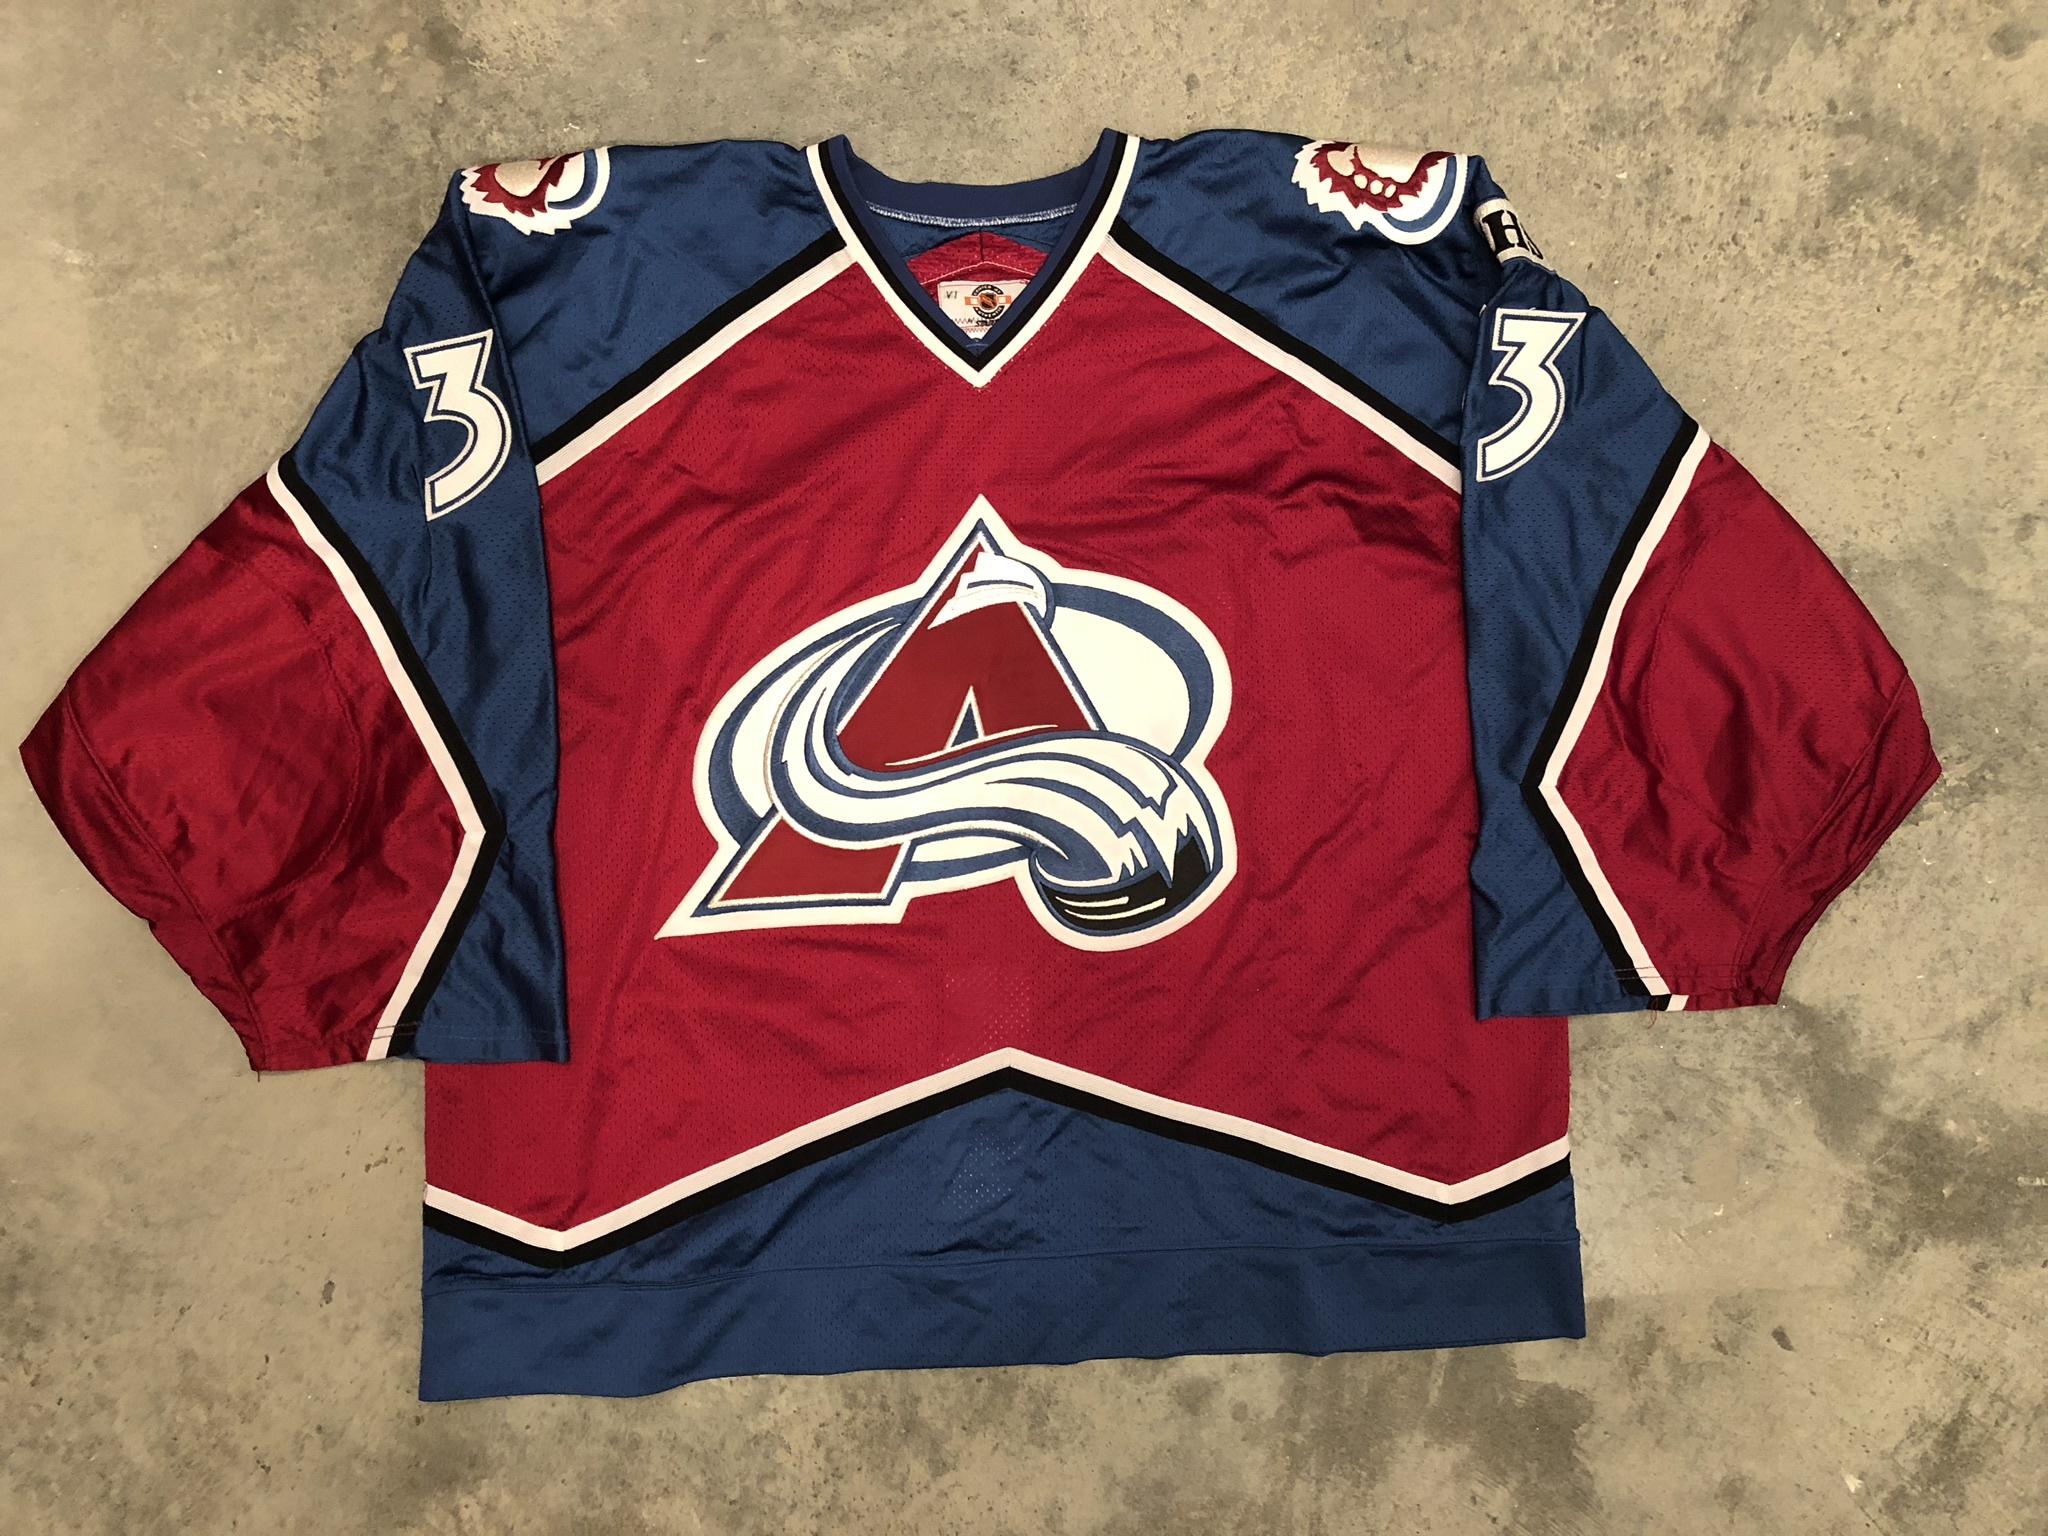 Patrick Roy NHL All Star Game Worn Jersey - 1989, 1990 & 1992 Vezina Winner